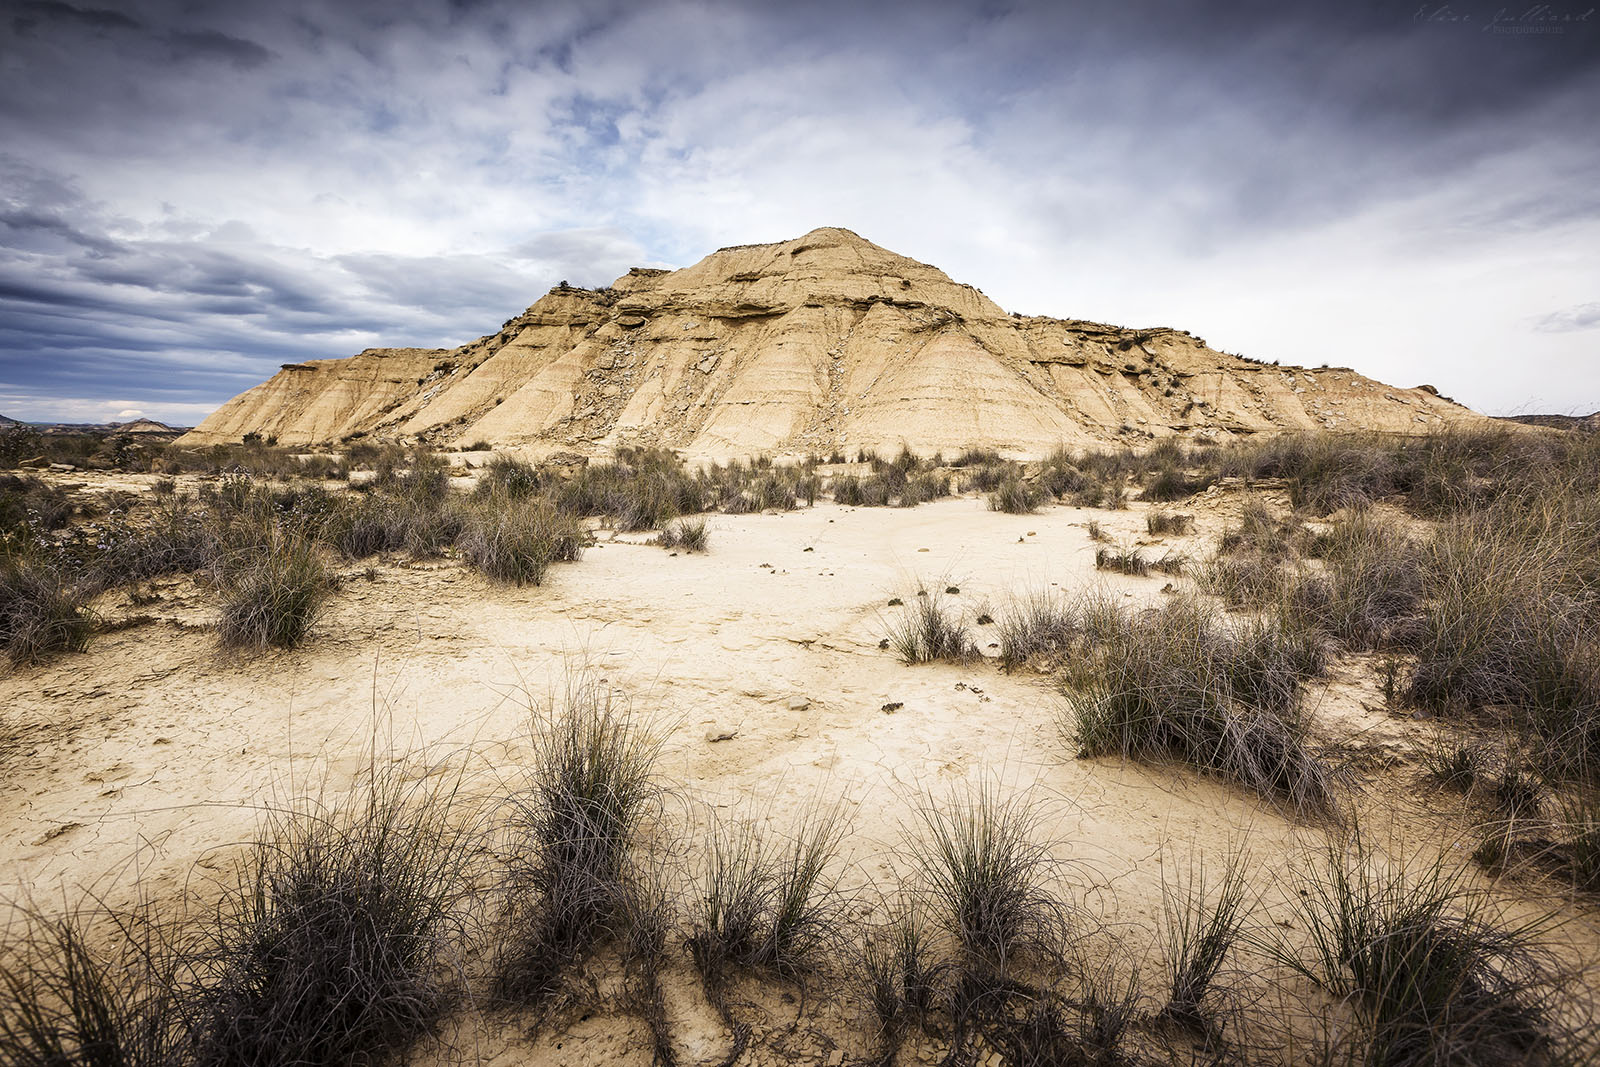 elise-julliard-photographe-lyon-voyage-roadtrip-travel-espagne-aventures-journal-route-tudela-bardenas-reales-navarre-arguedas-desert-2